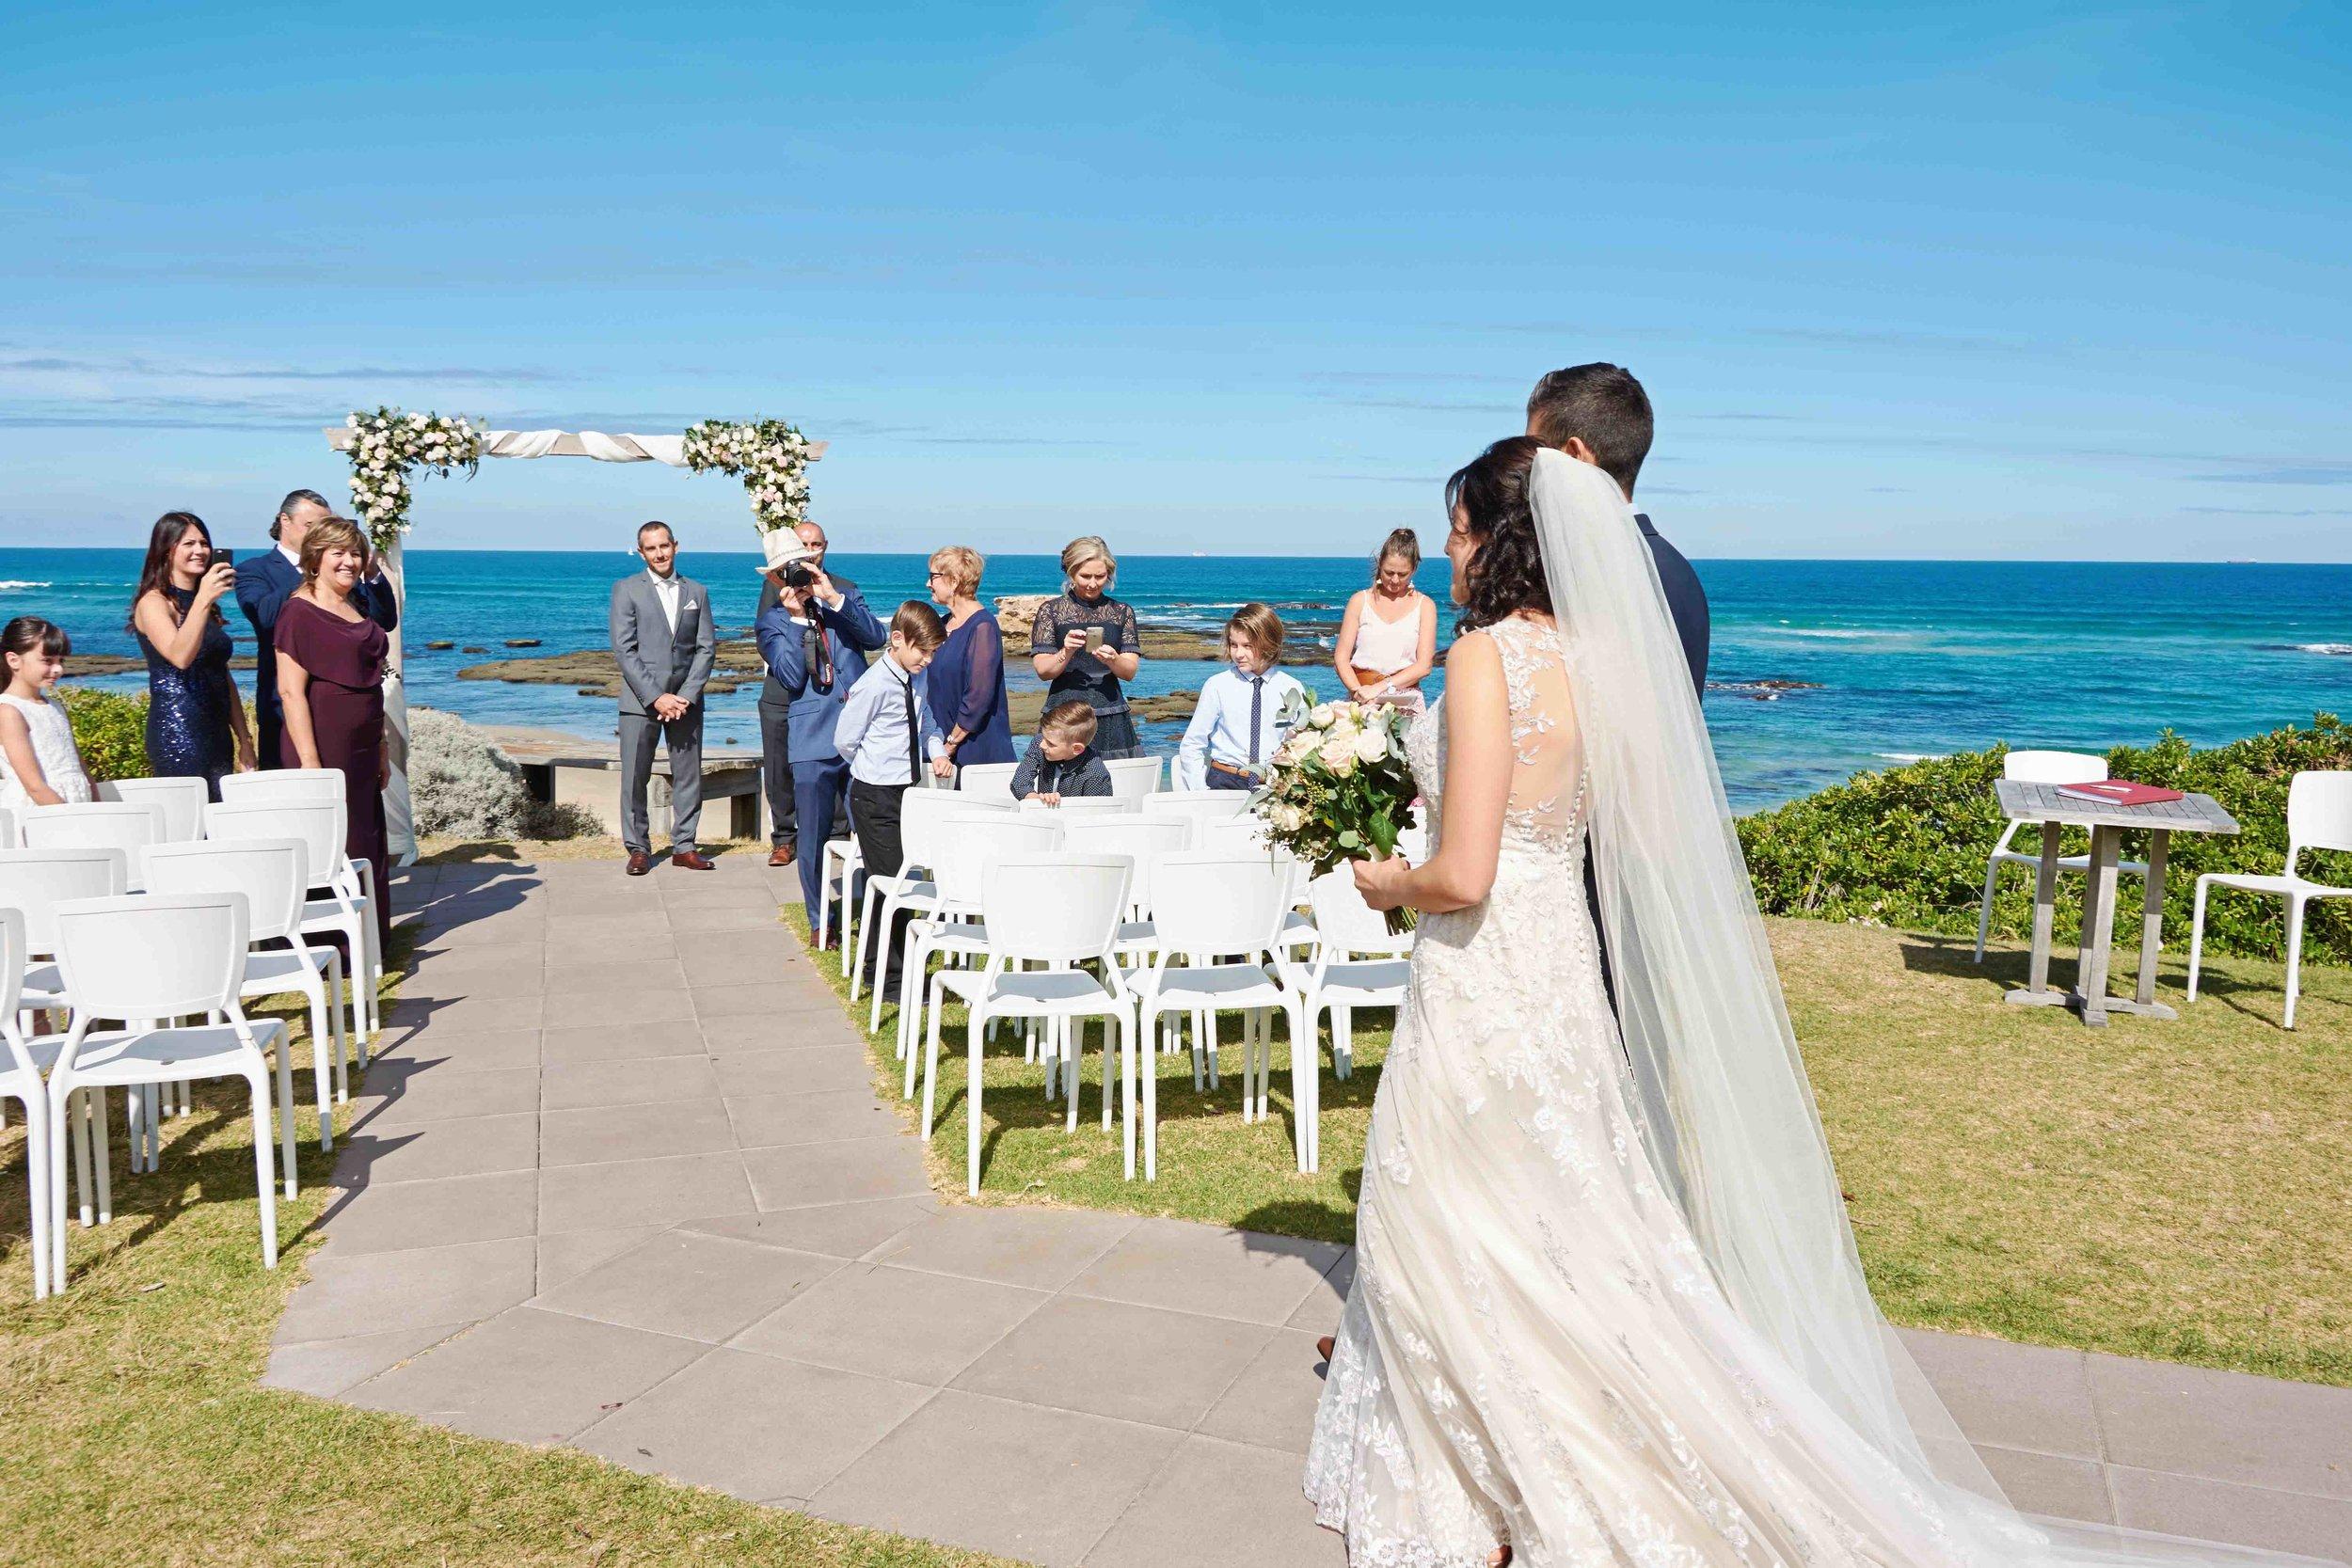 sorrento-wedding-photography-all-smiles-marissa-jade-photography-39.jpg